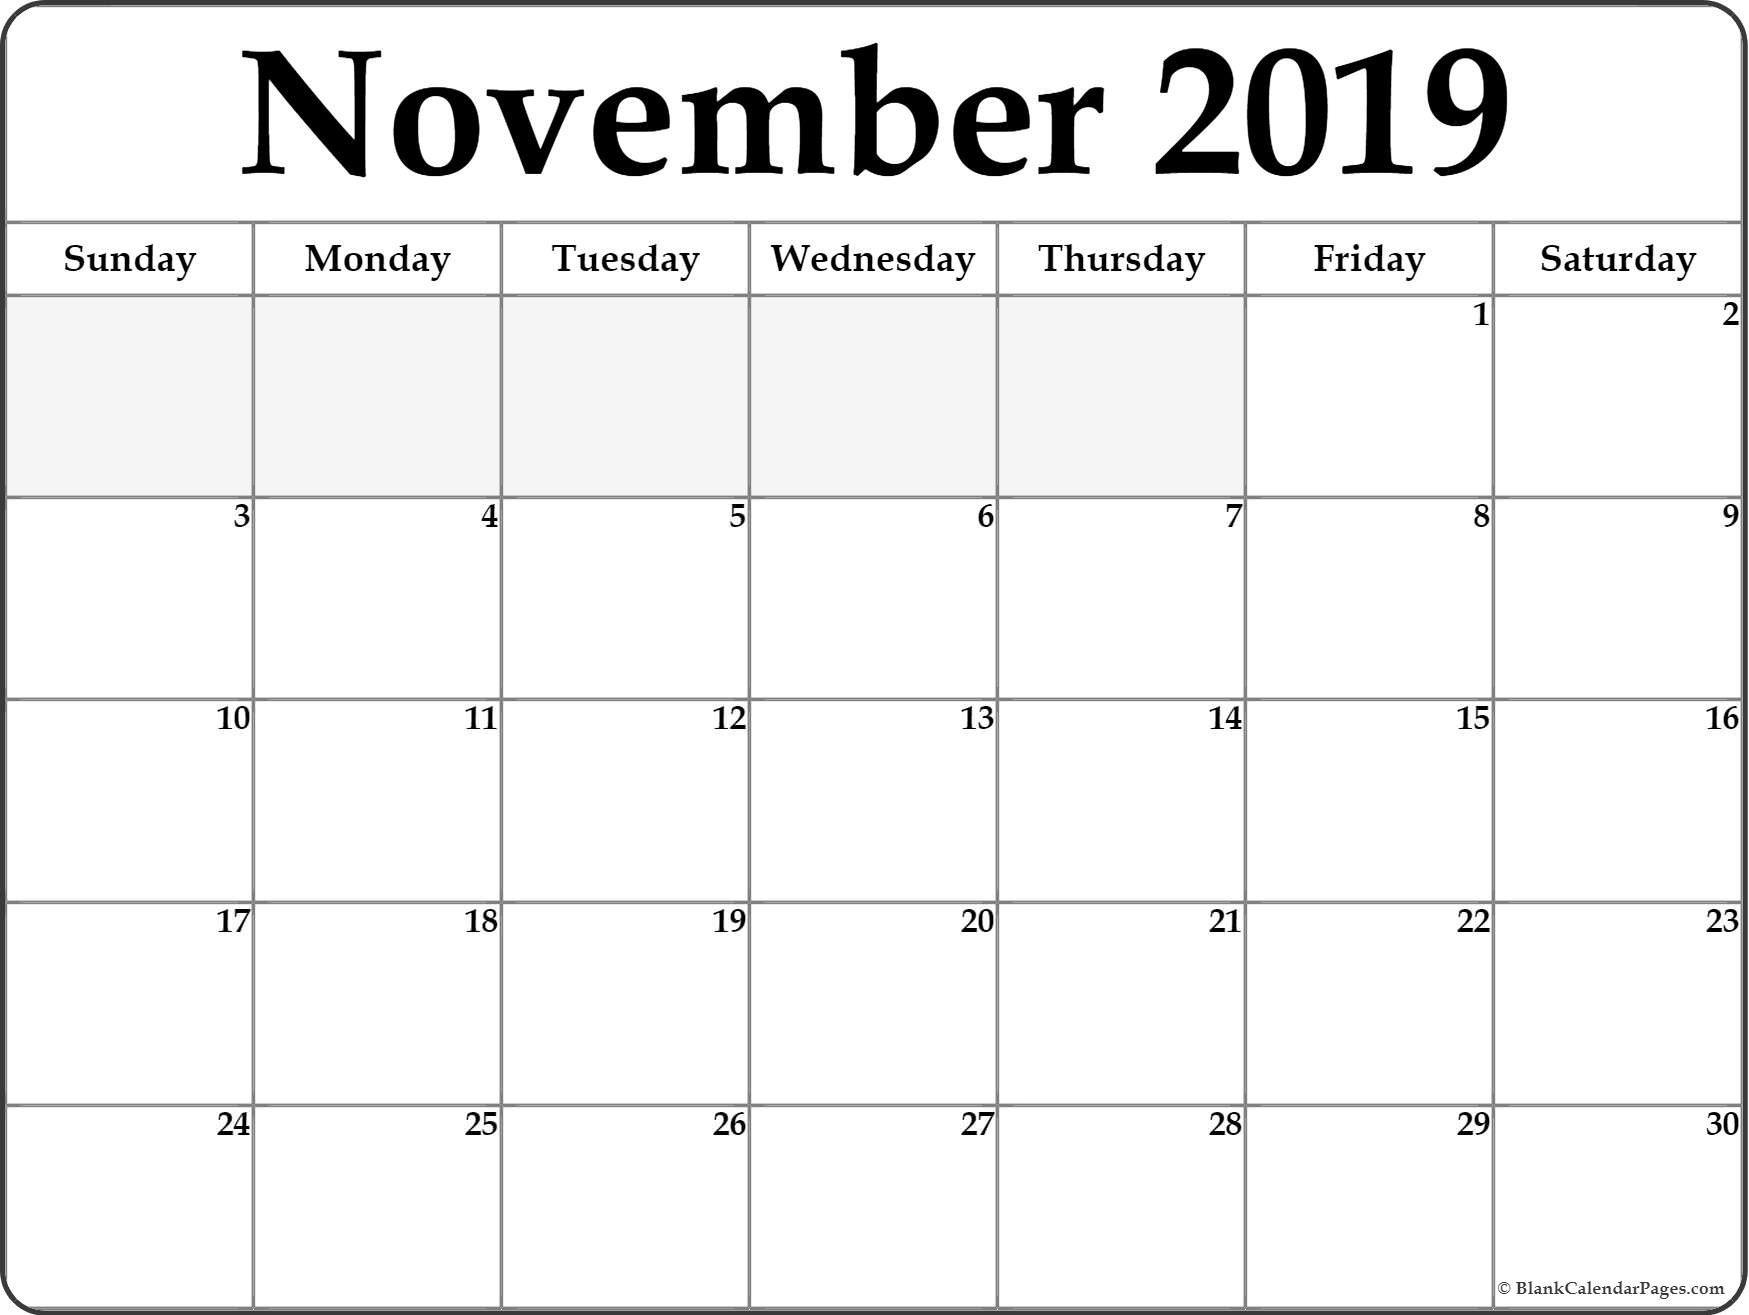 Clipart – Free – Calendar – November 2019 – Template pertaining to November Calendar Clipart Free